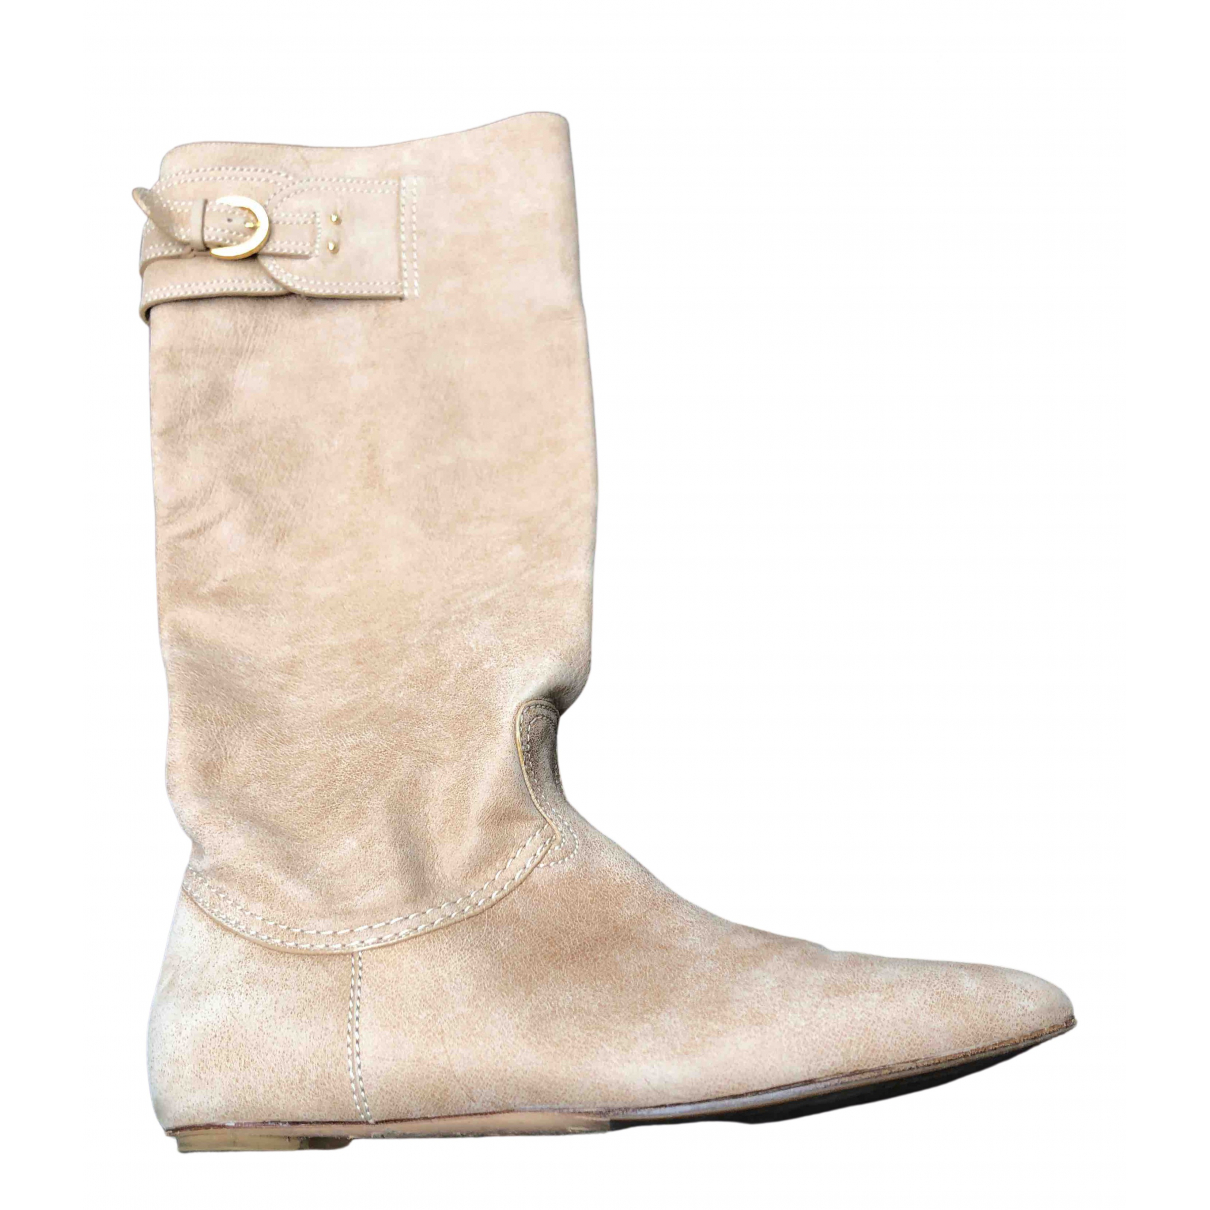 Casadei \N Beige Suede Boots for Women 37.5 EU